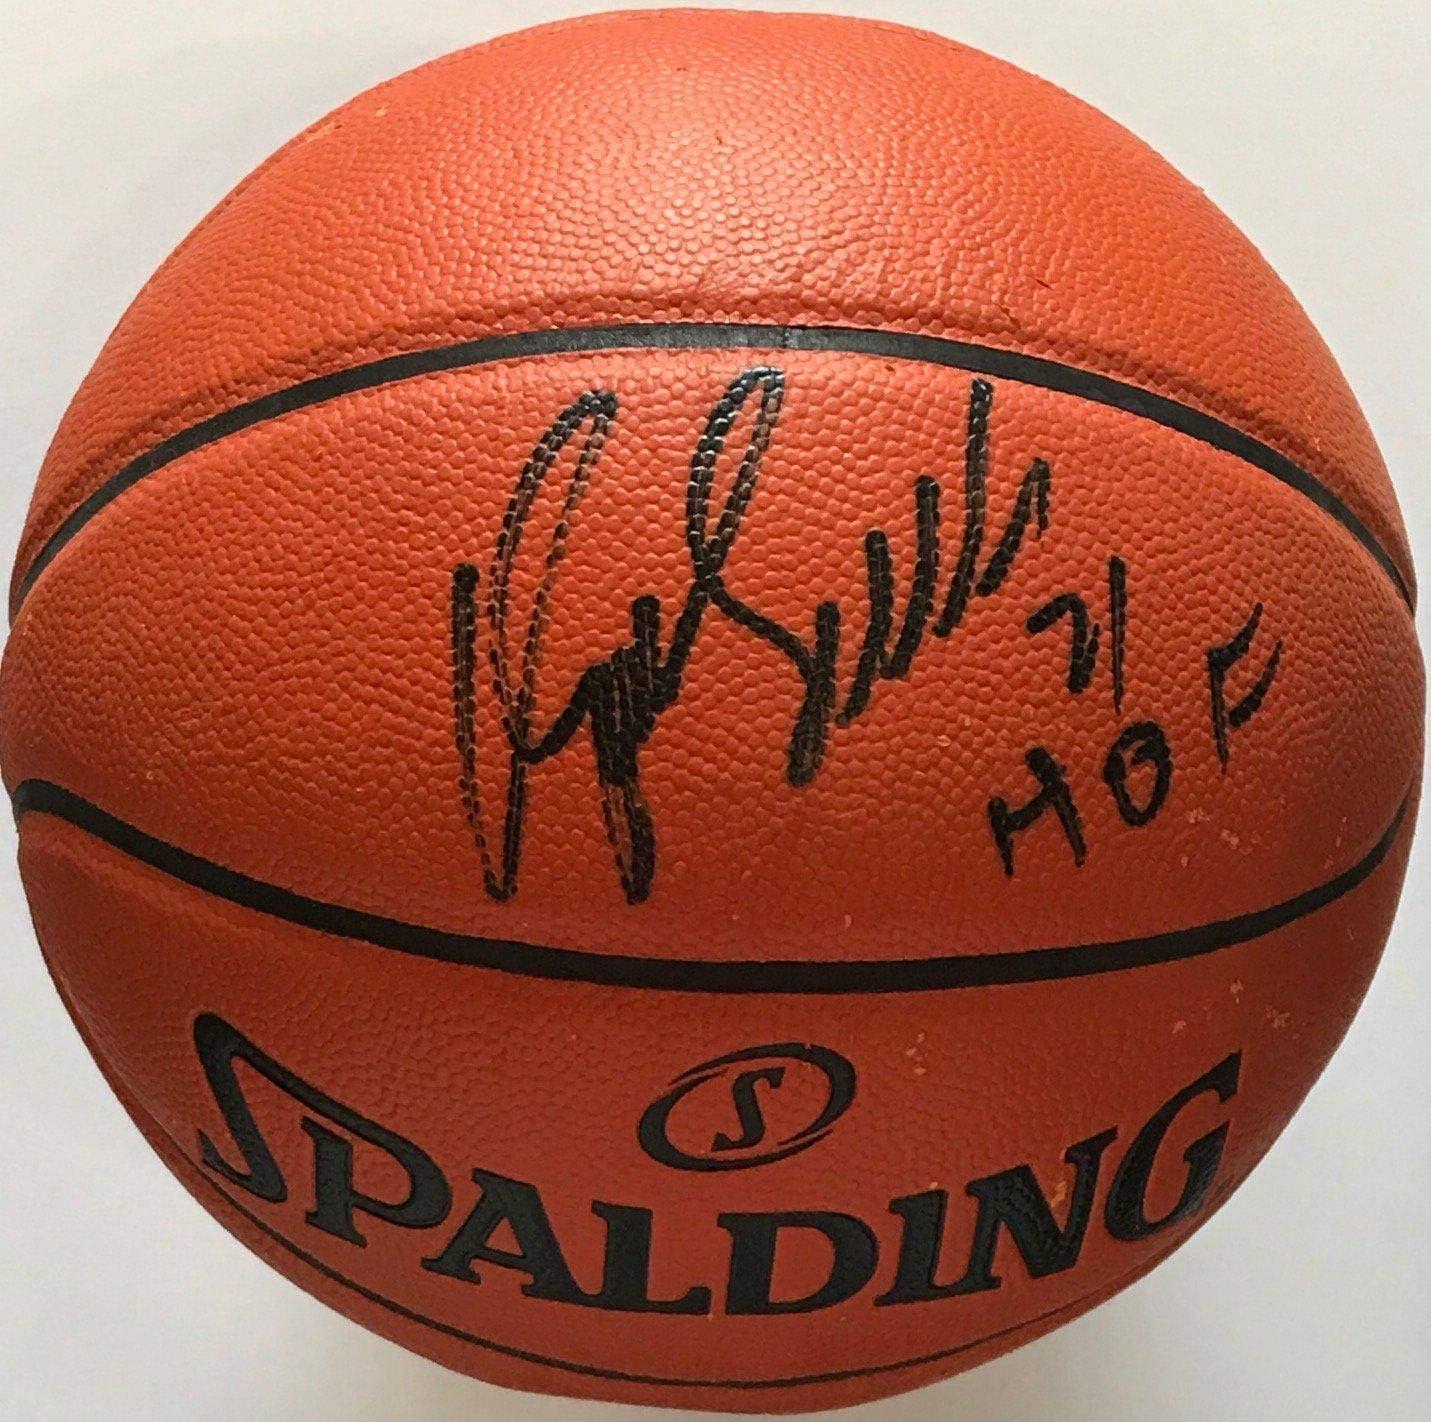 Dominique Wilkins Autographed Hybrid Basketball Autographed Basketballs